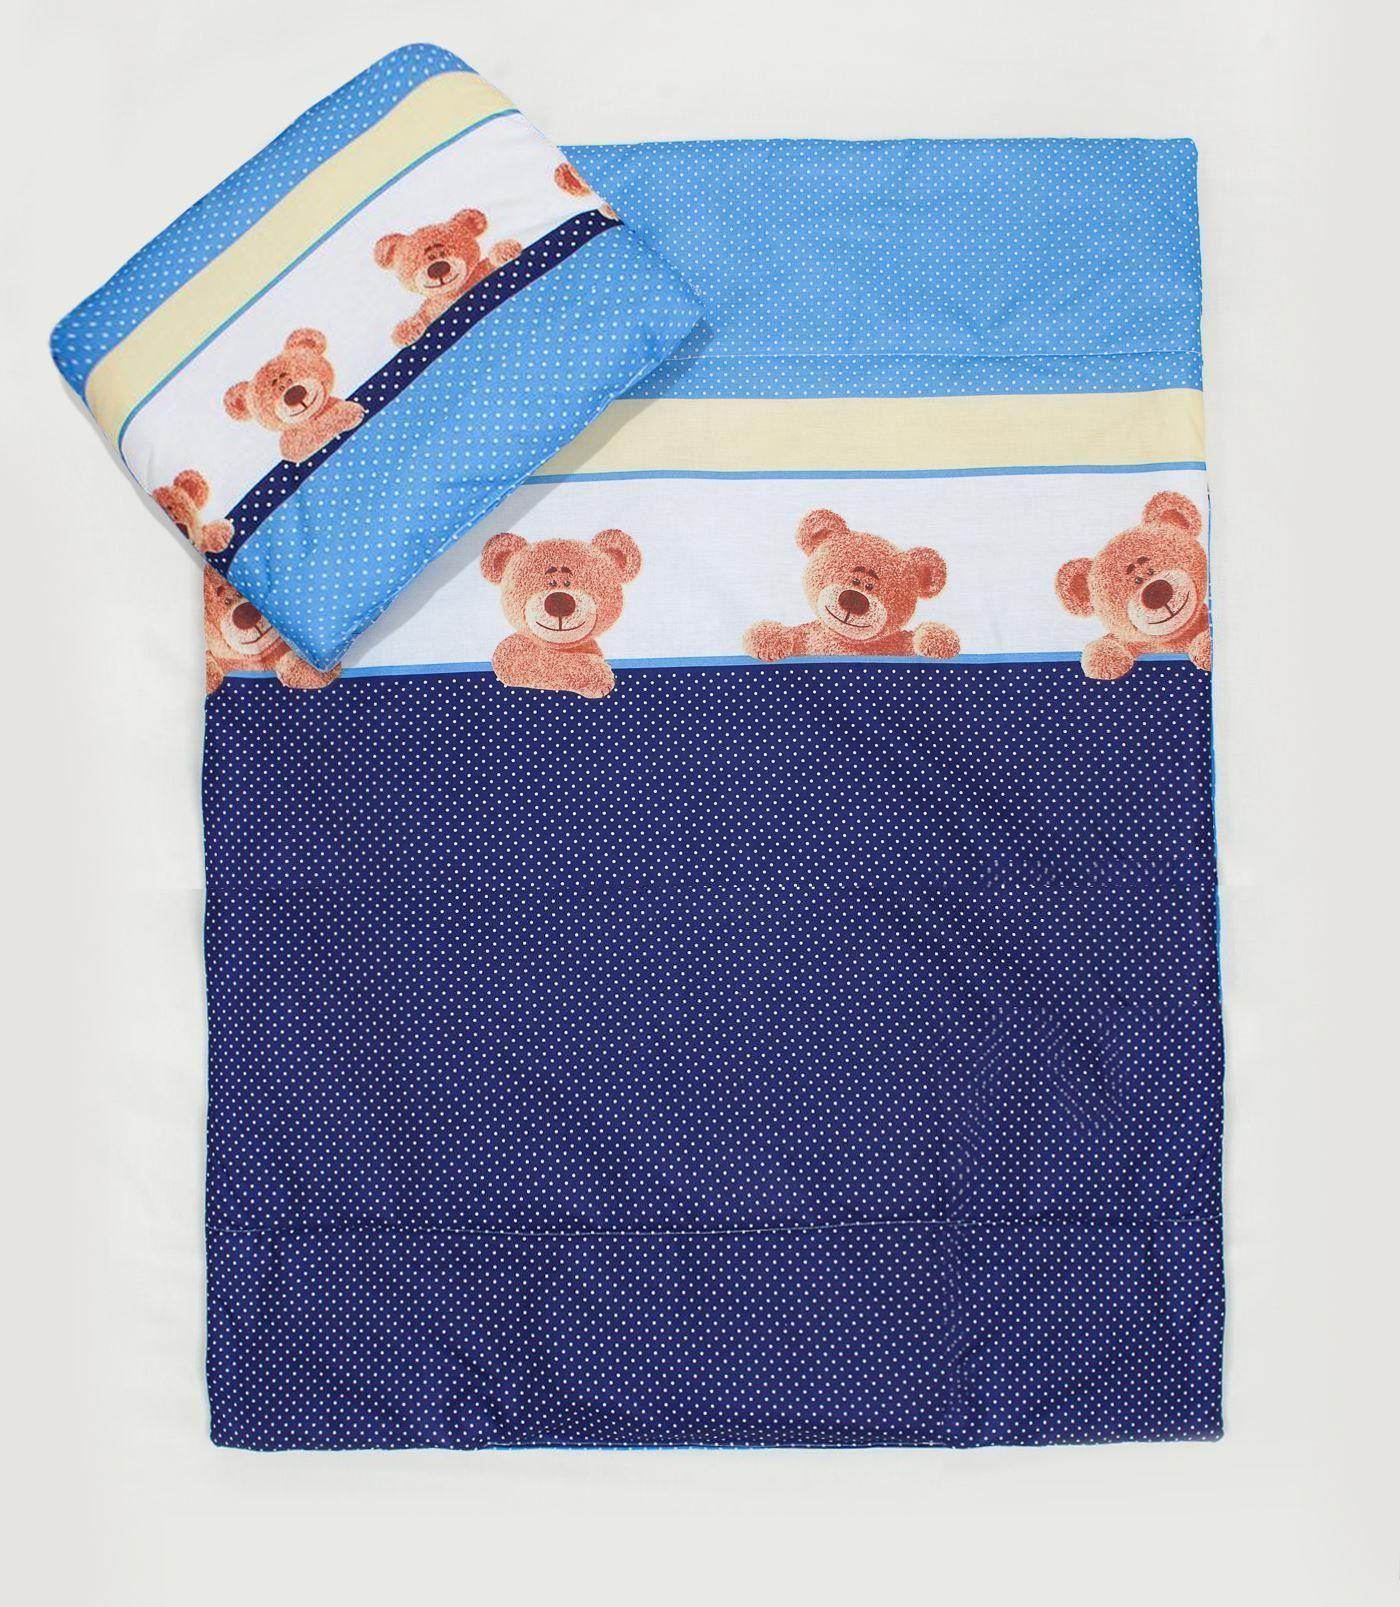 Crib pillows babies - Details About 2 Piece Quilt Duvet Pillow Set Baby Crib Cradle Pram Cot Bedding Filling Set